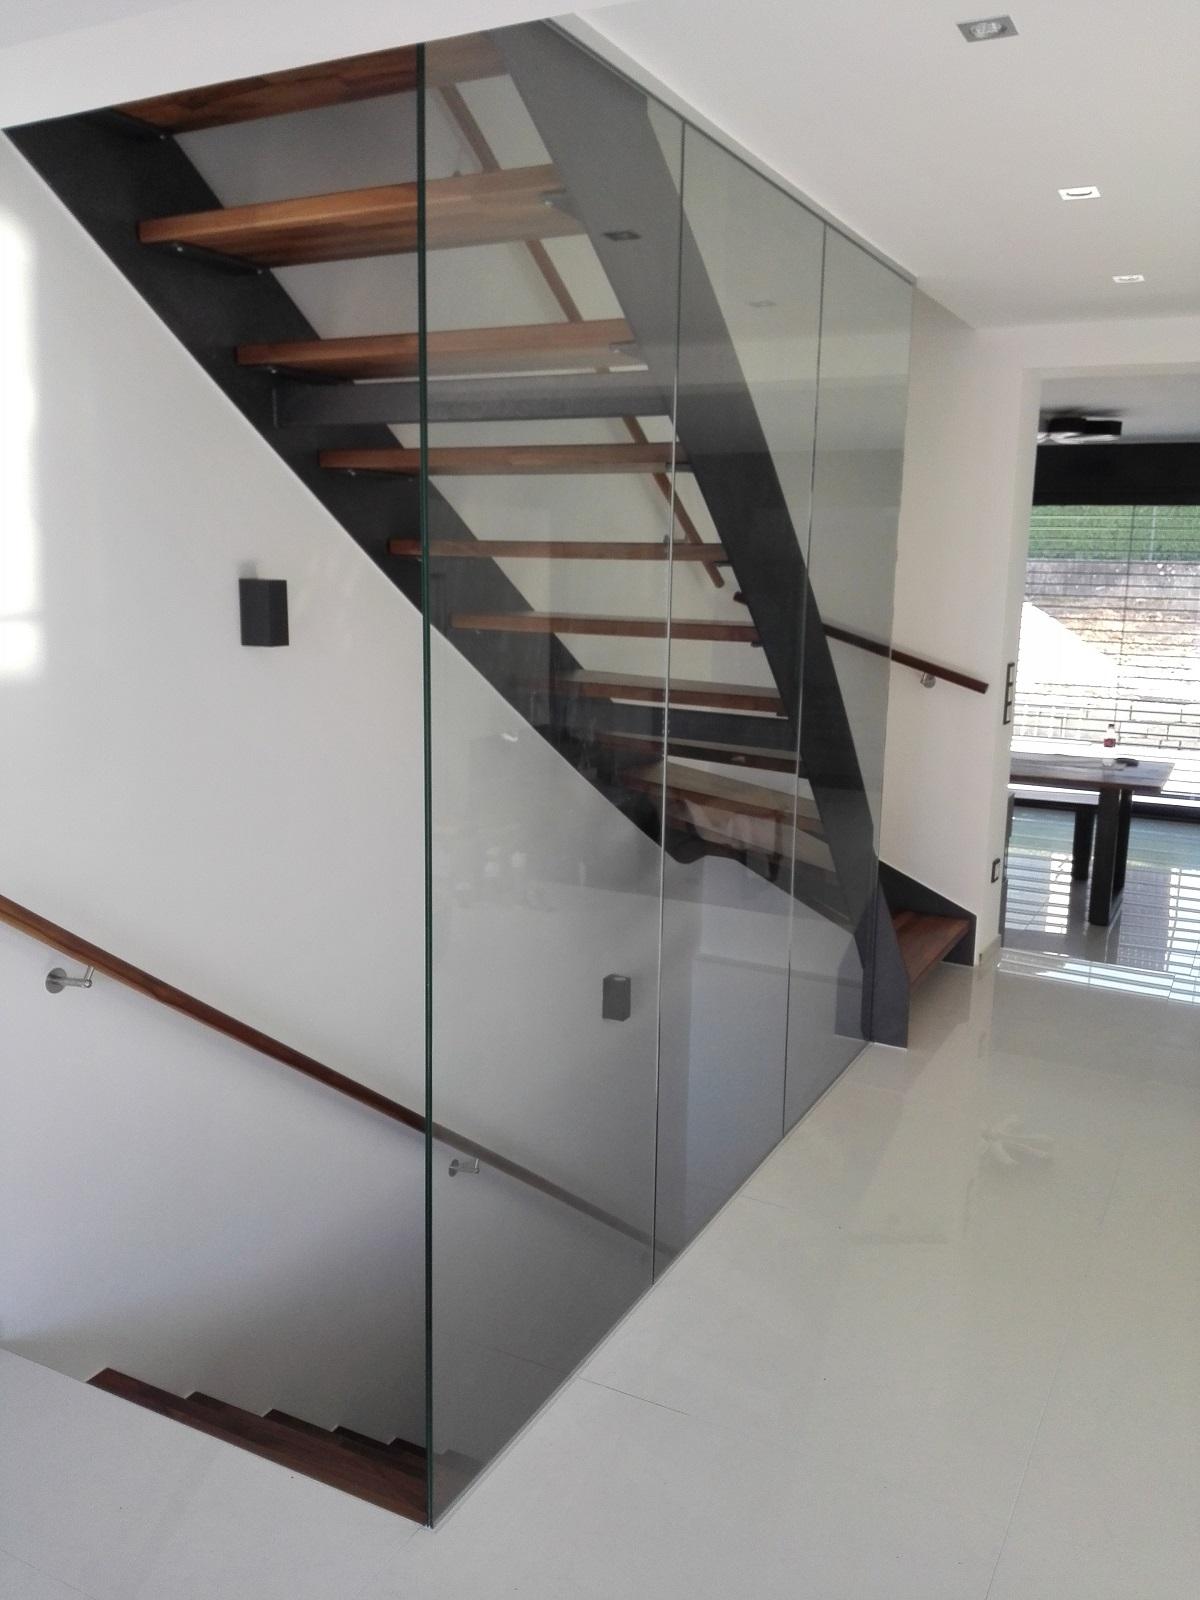 GLASMACK Montage in Glas